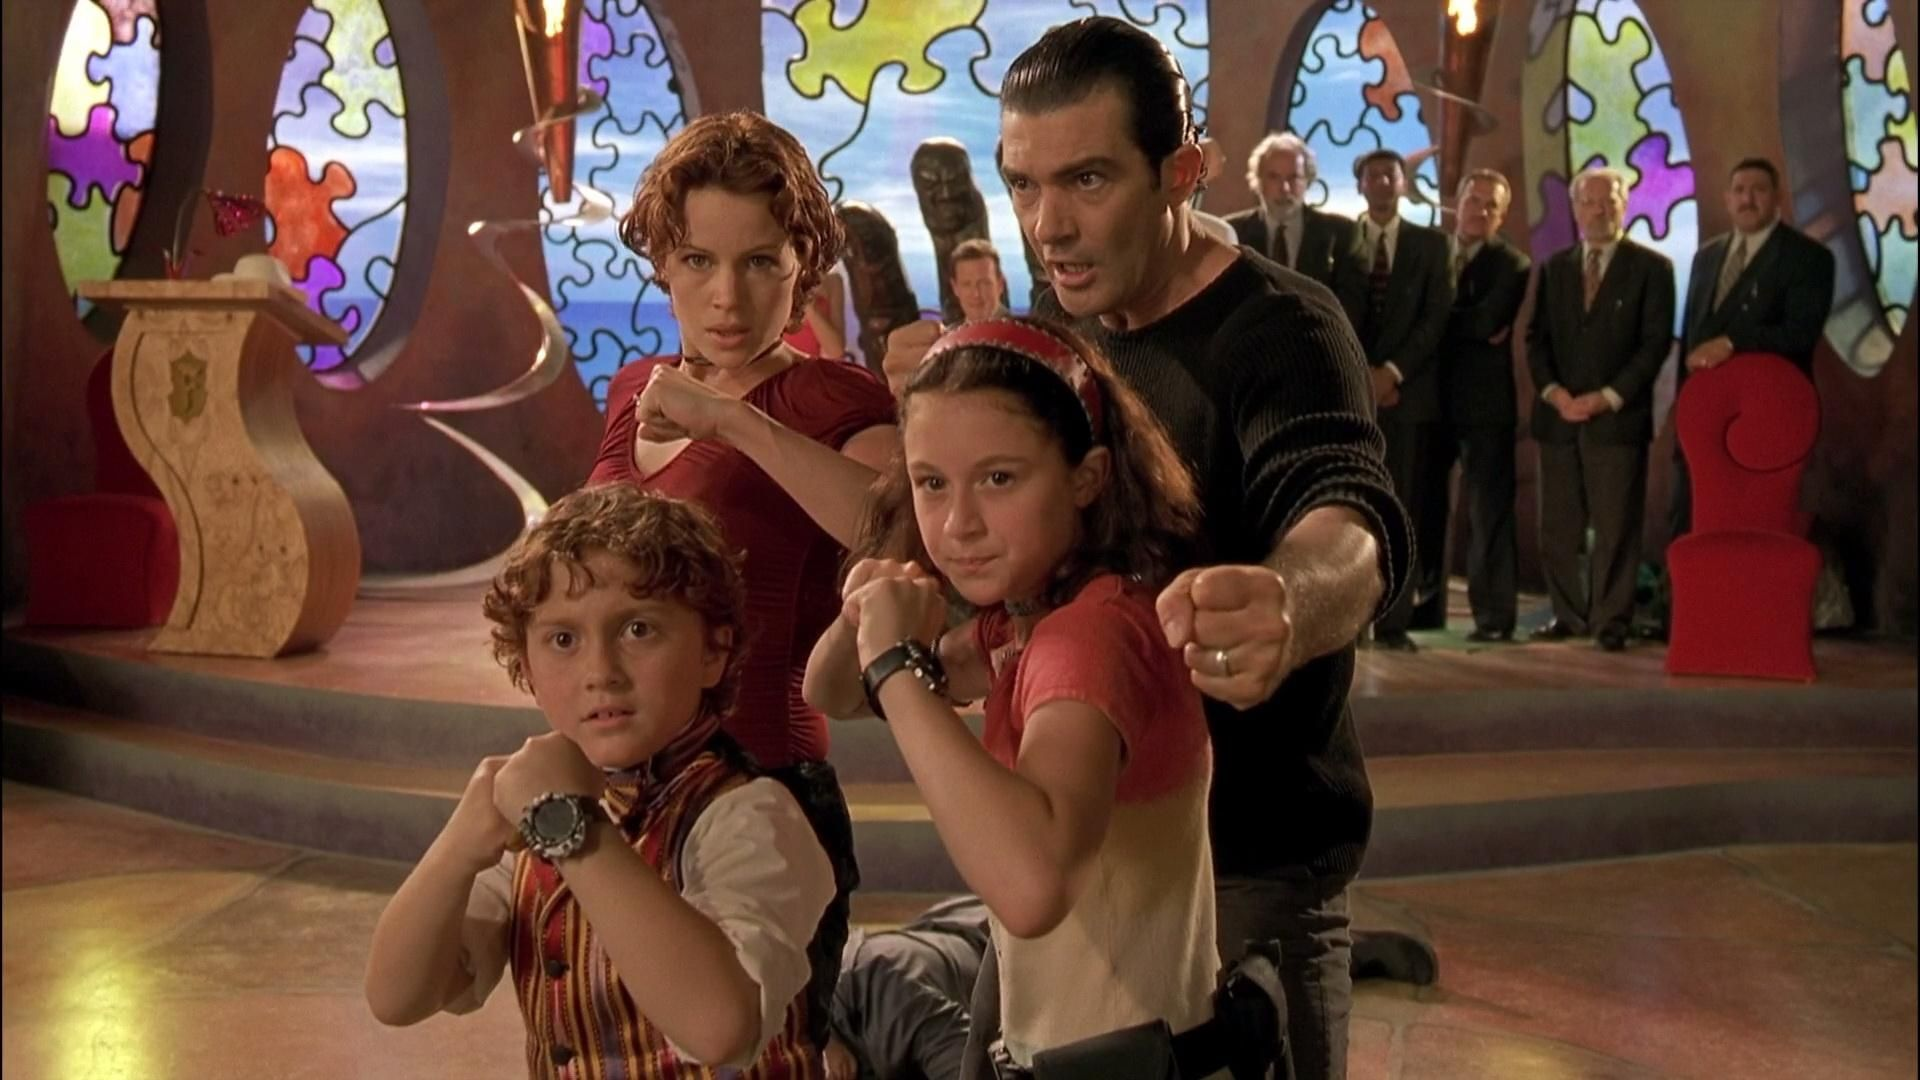 Spy Kids Spy kids movie, Best kid movies